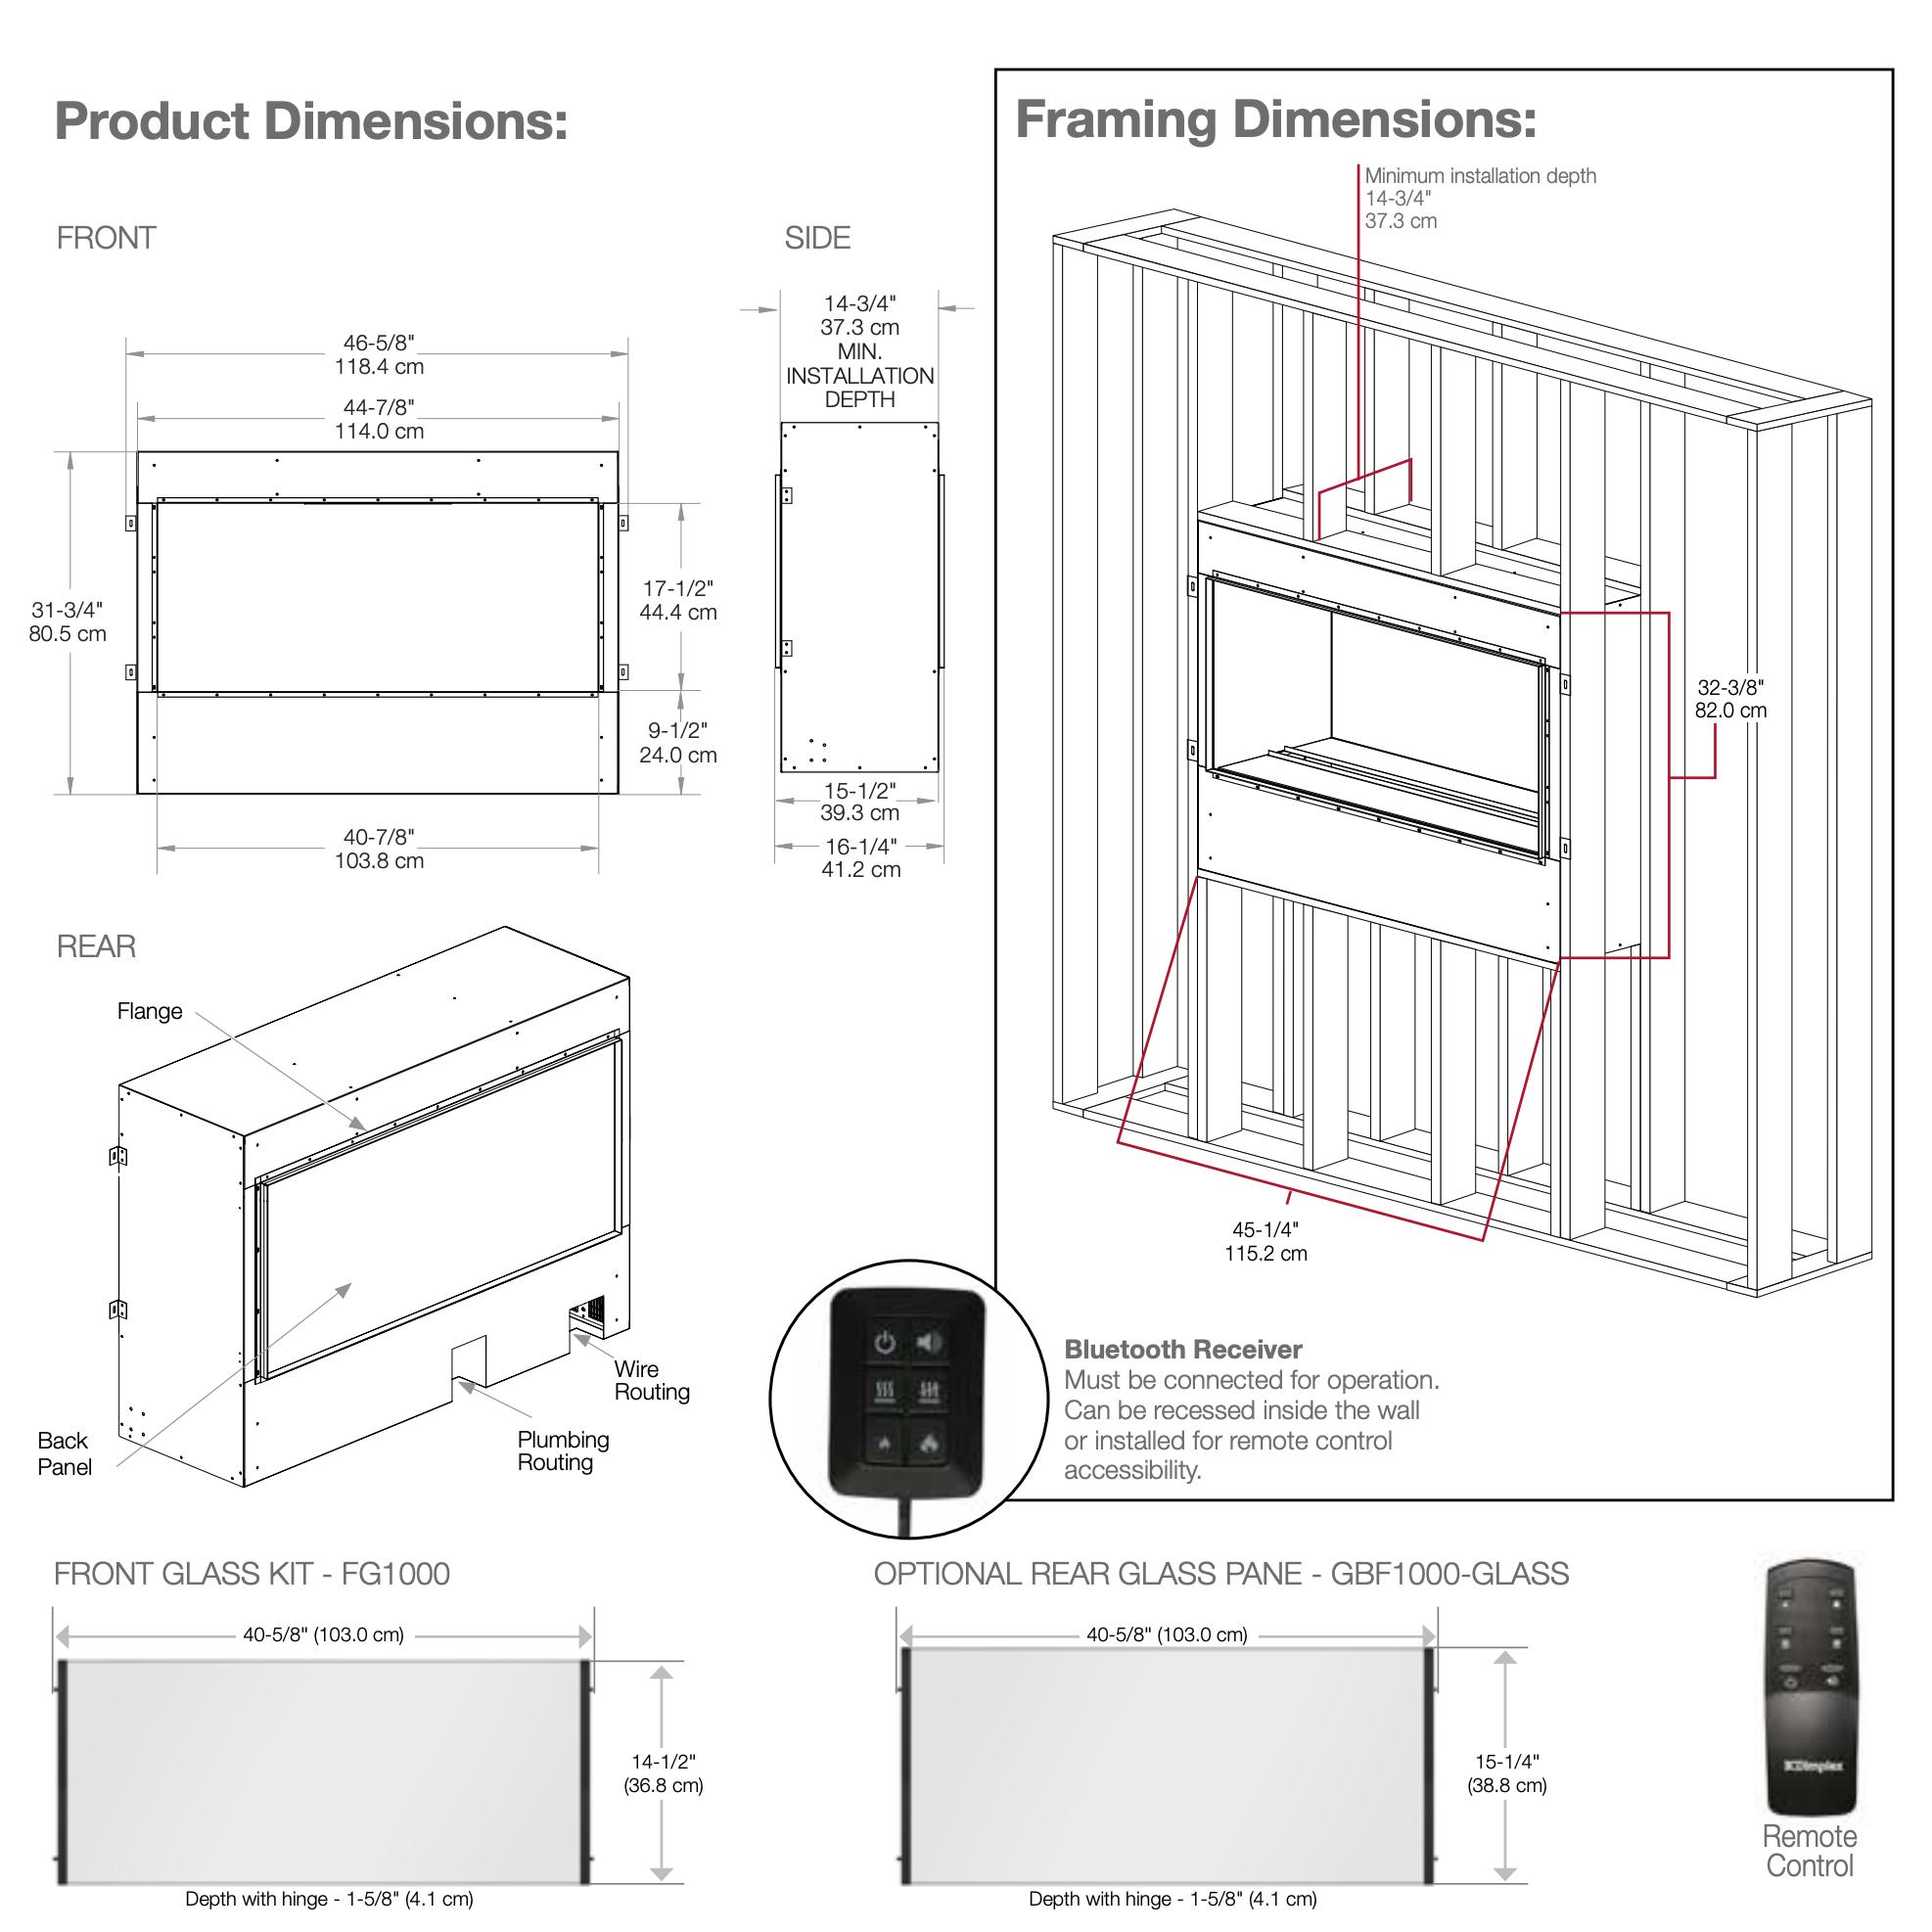 gbf1000-dimensions-framing.png